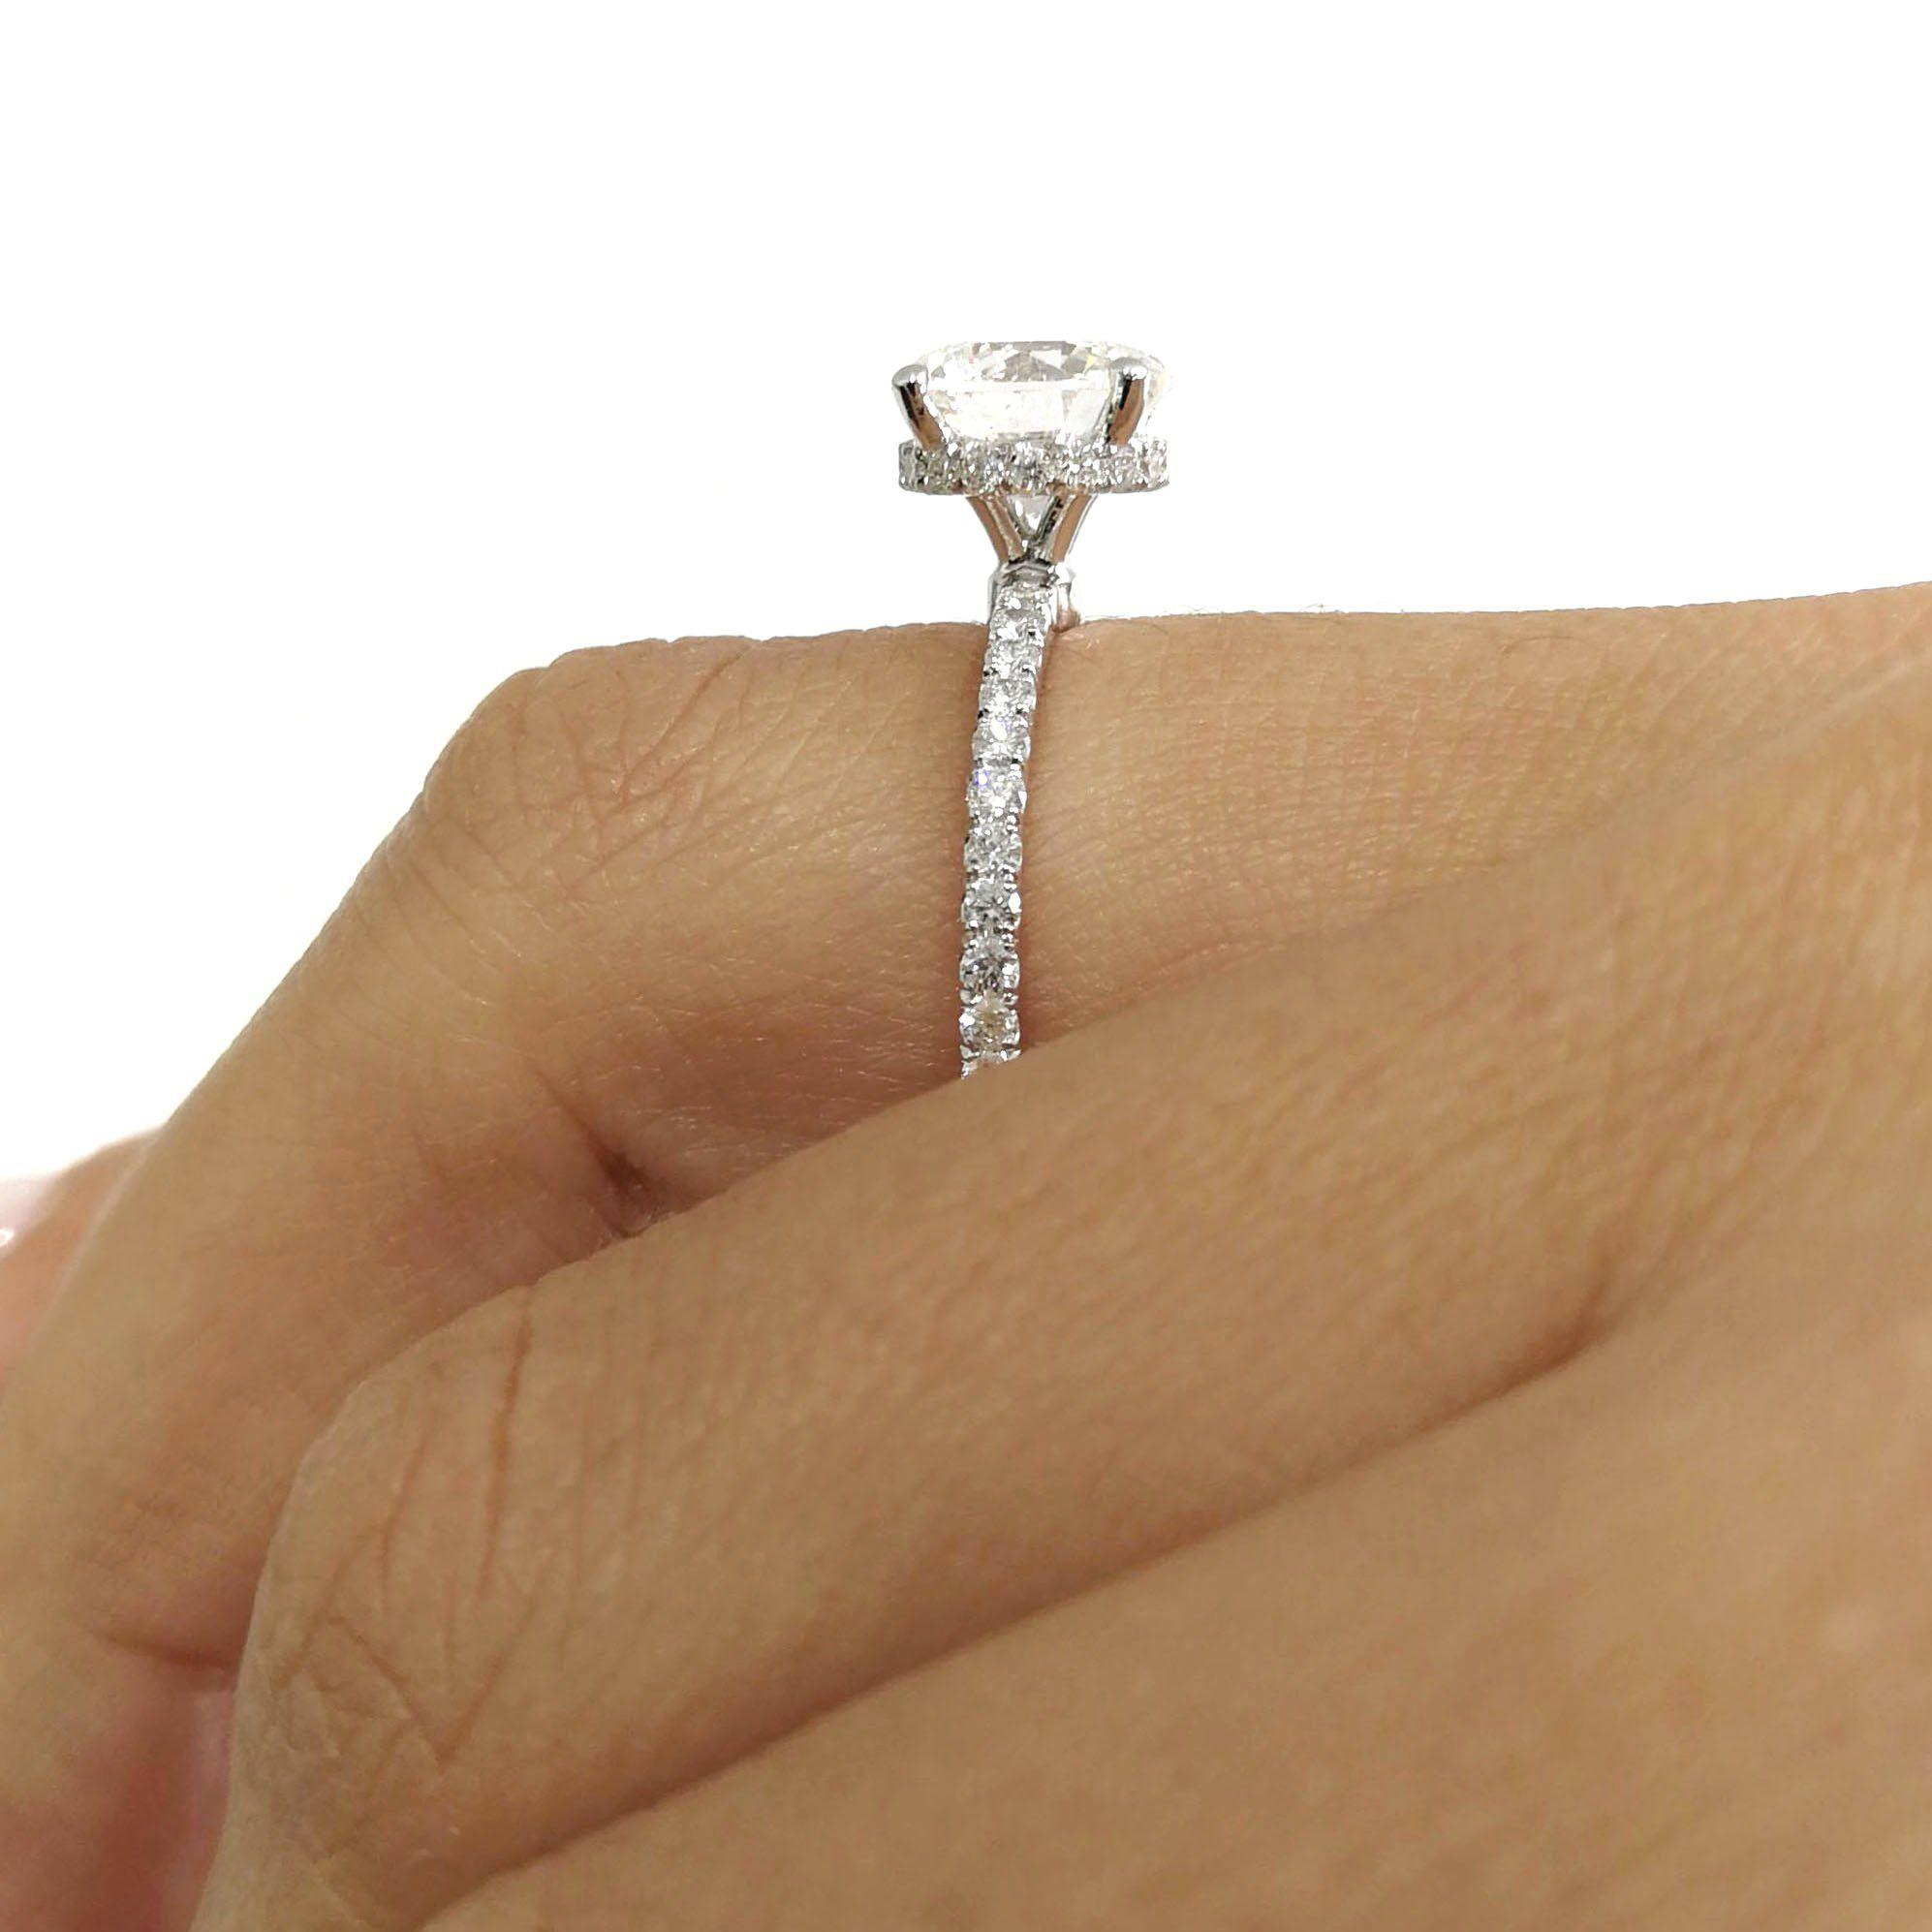 Carat D Vs Round Hidden Halo Design Diamond Engagement Ring K White Gold J